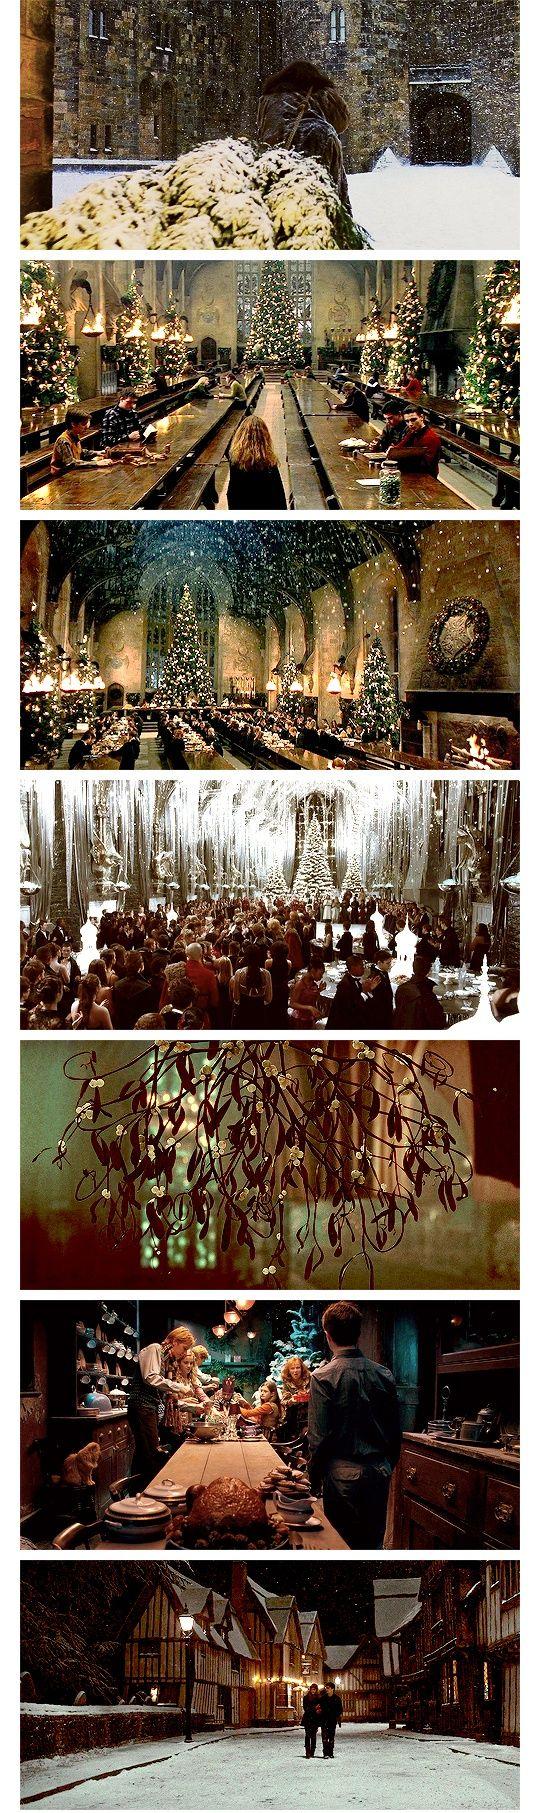 Harry Potter films Christmas